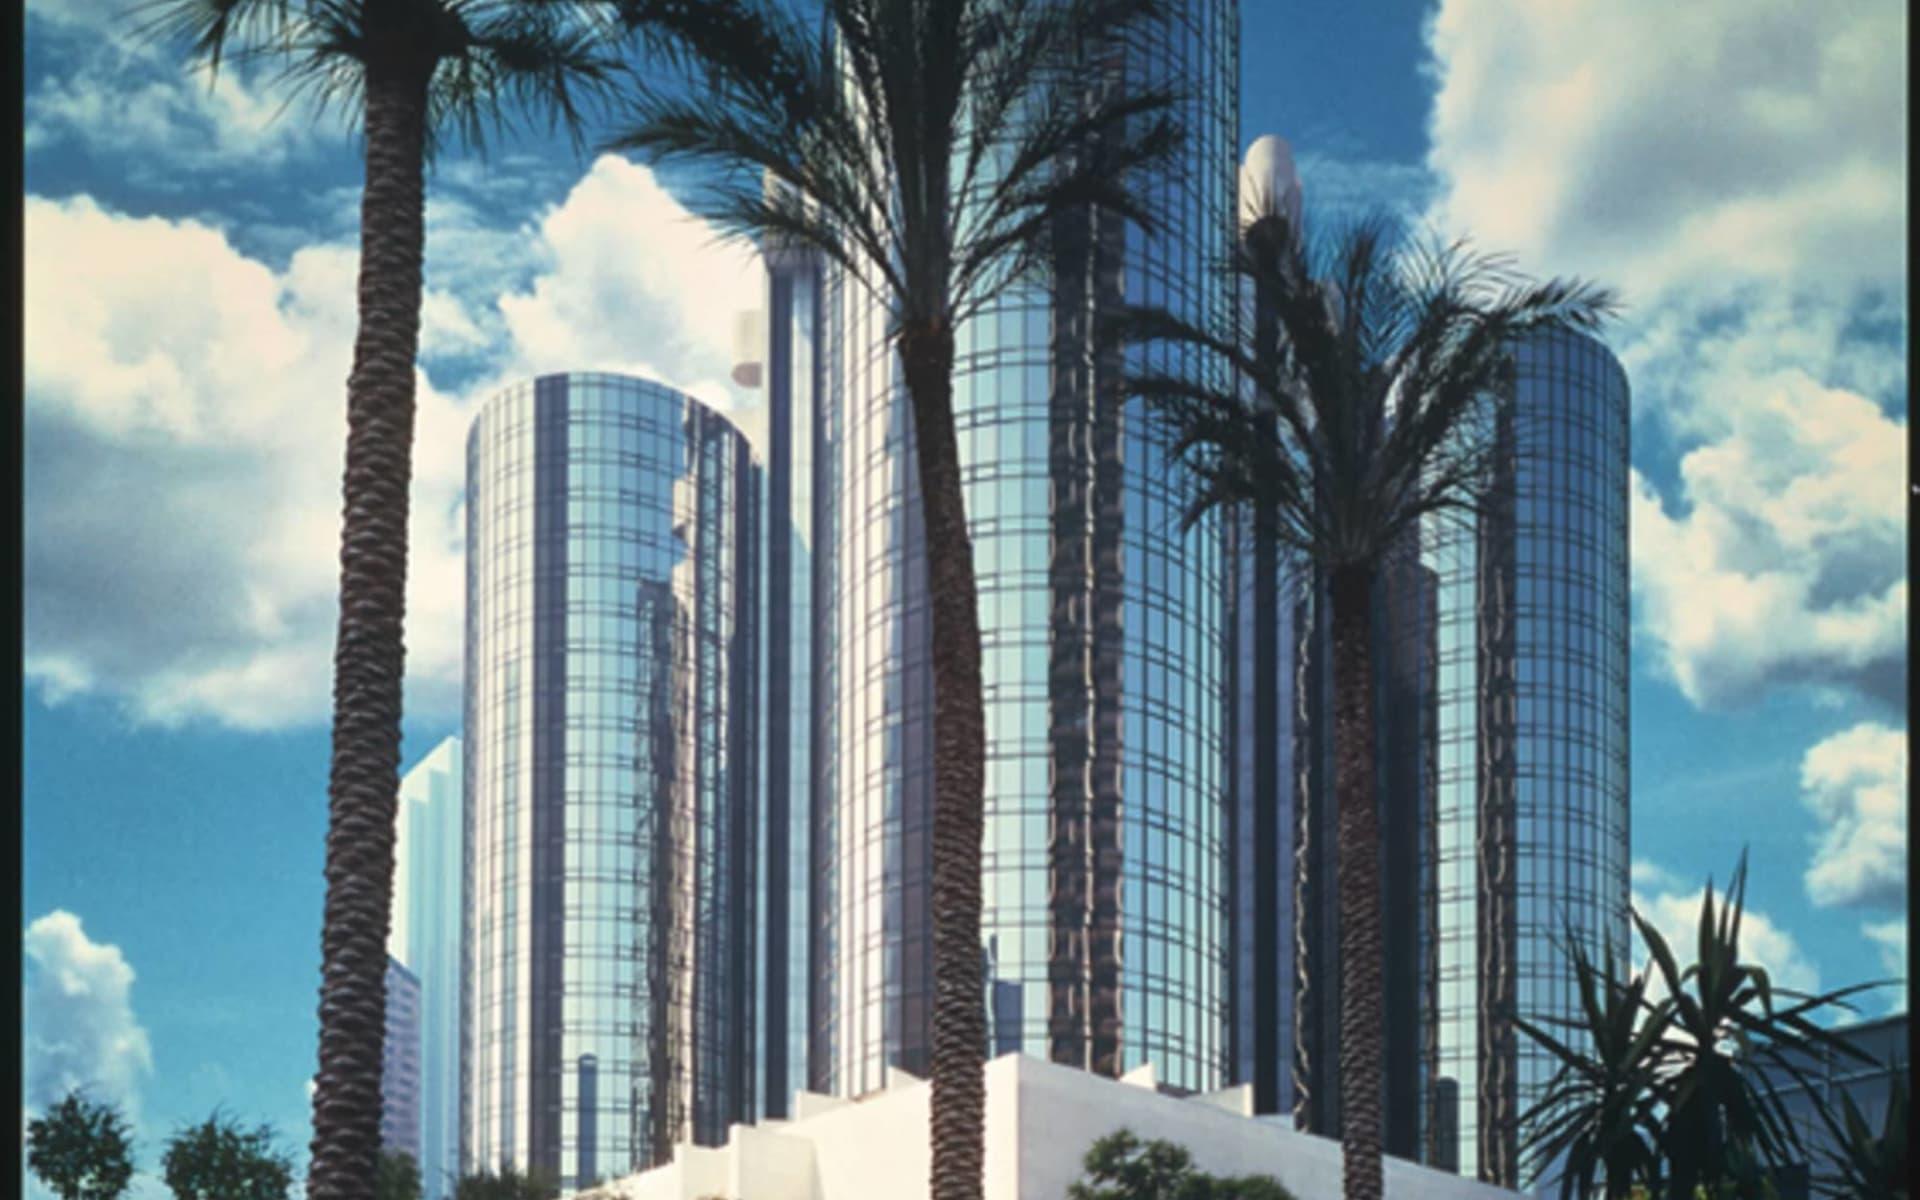 The Westin Bonaventure Hotel & Suites Los Angeles: exterior westin bonaventure los angeles hotelansicht palmen